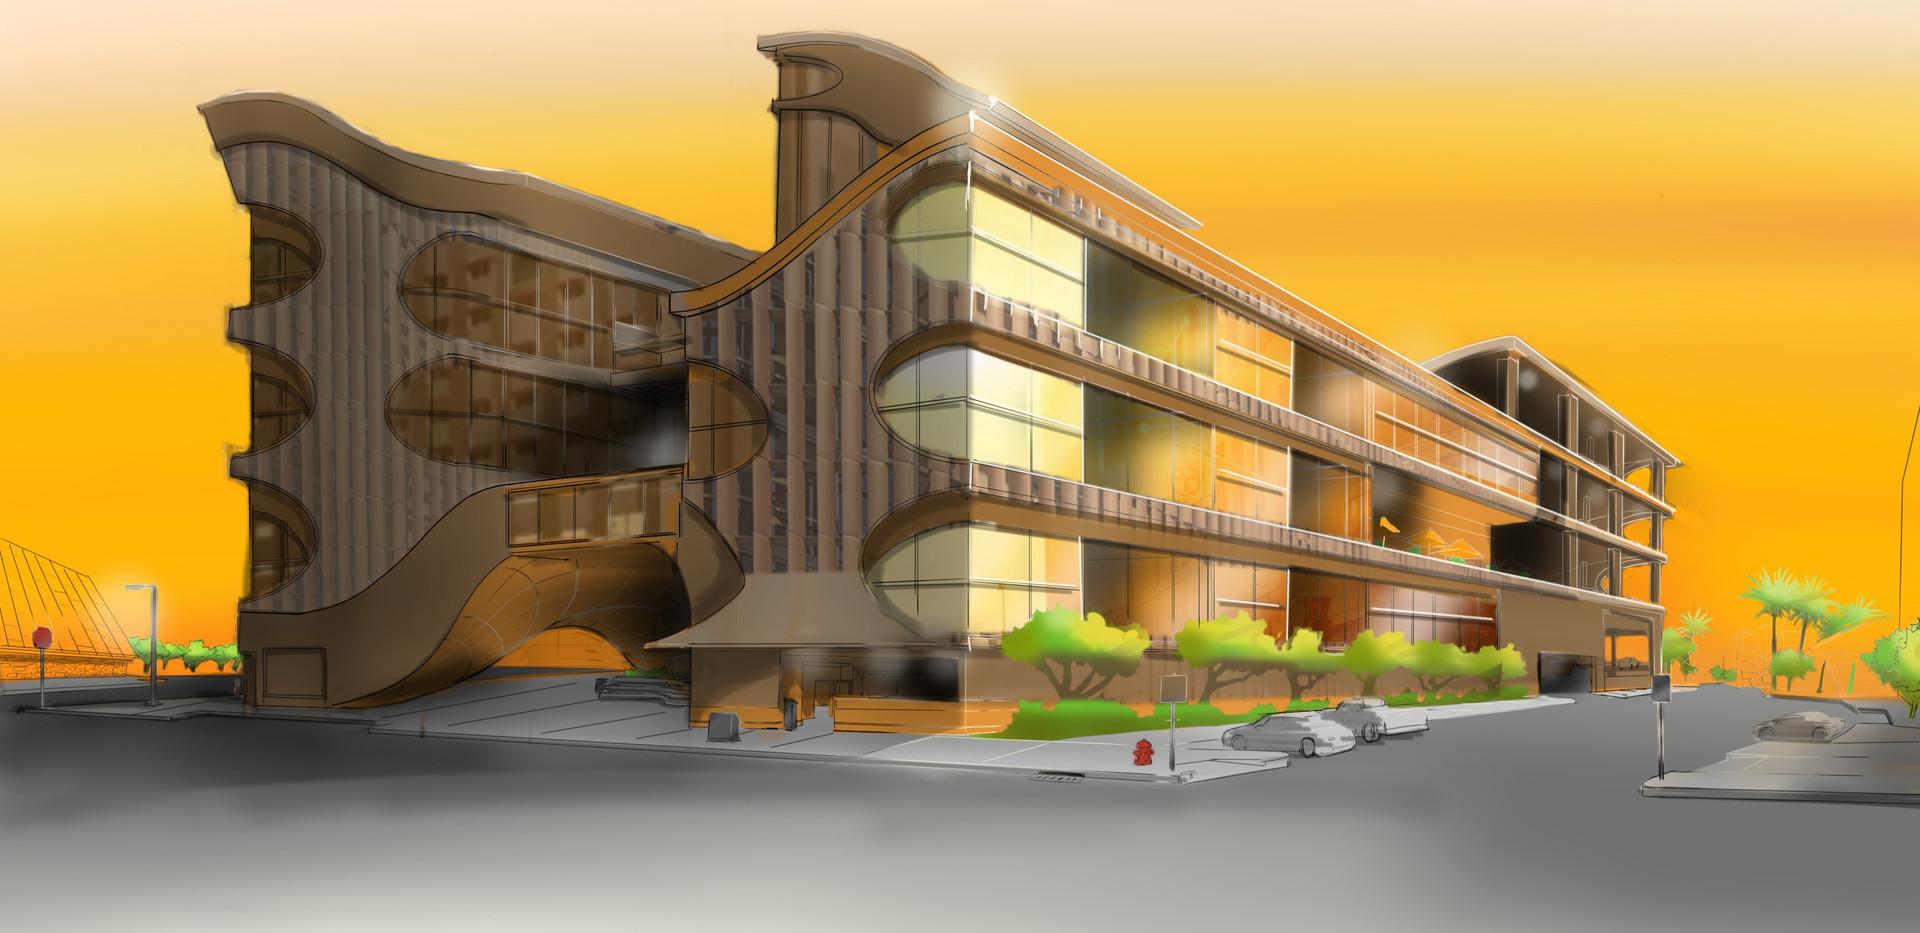 Concept Building for Accelerator Program